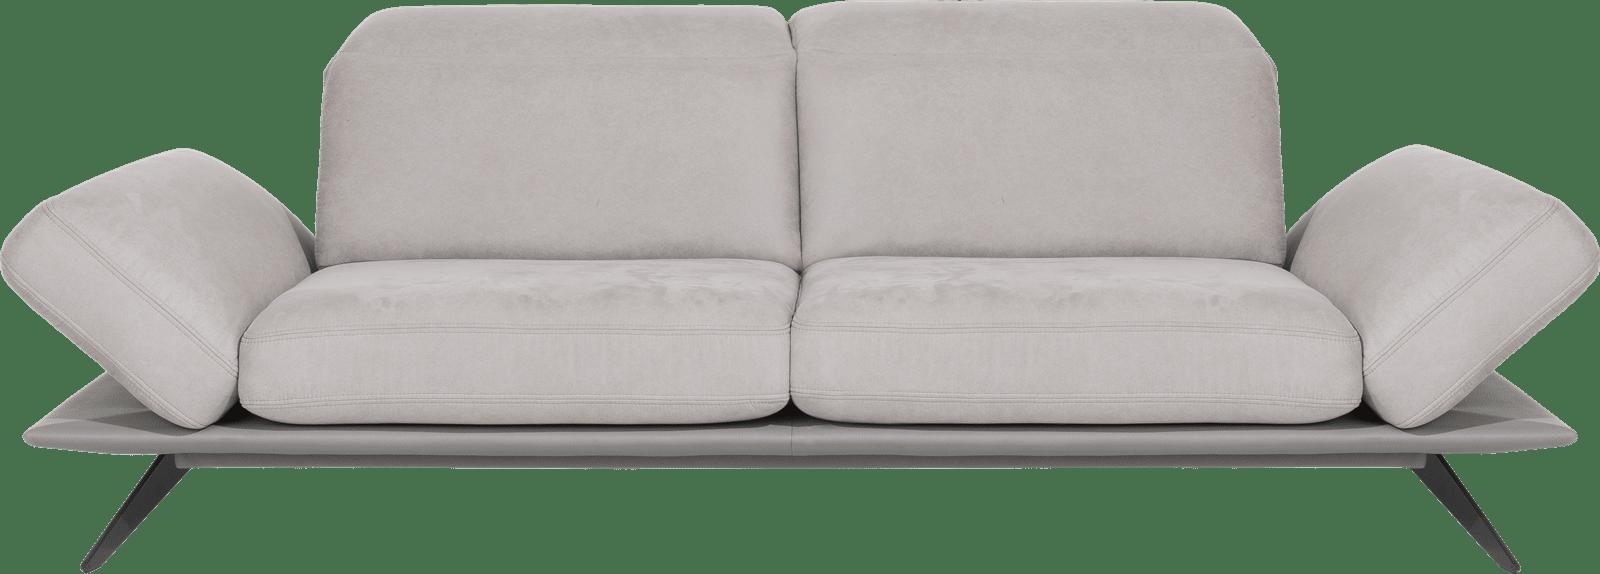 XOOON - Paxos - Design minimaliste - Canapes - 3-places